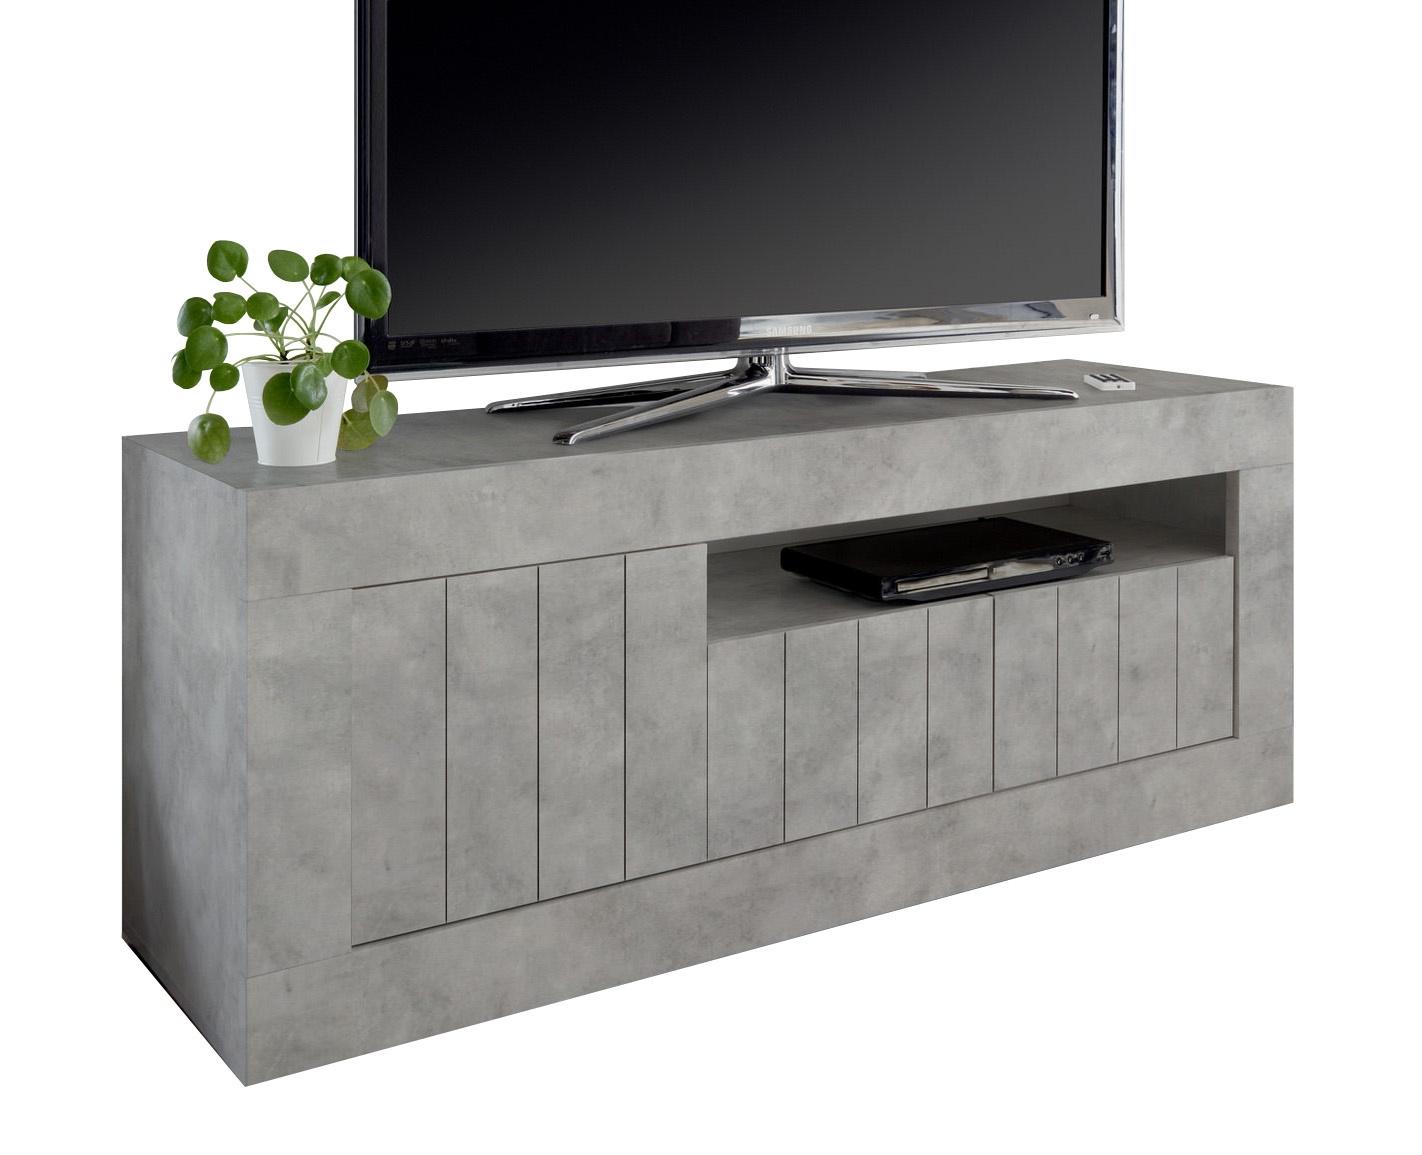 Tv-meubel Urbino 138 cm breed in grijs beton | Pesaro Mobilia